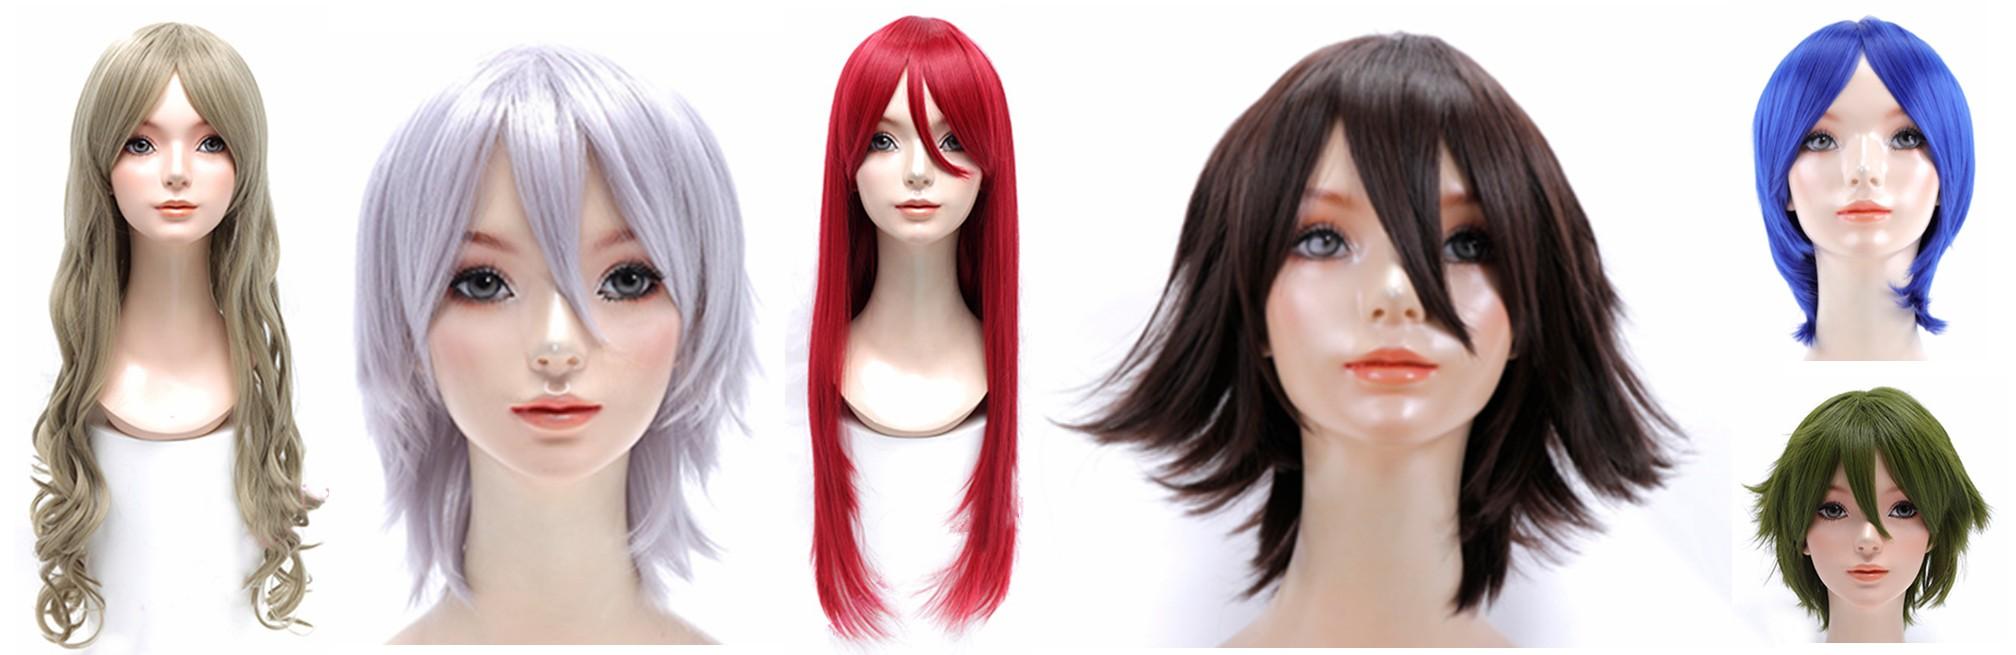 Japanese Cosplay Wig Brands: Cospedia Wig